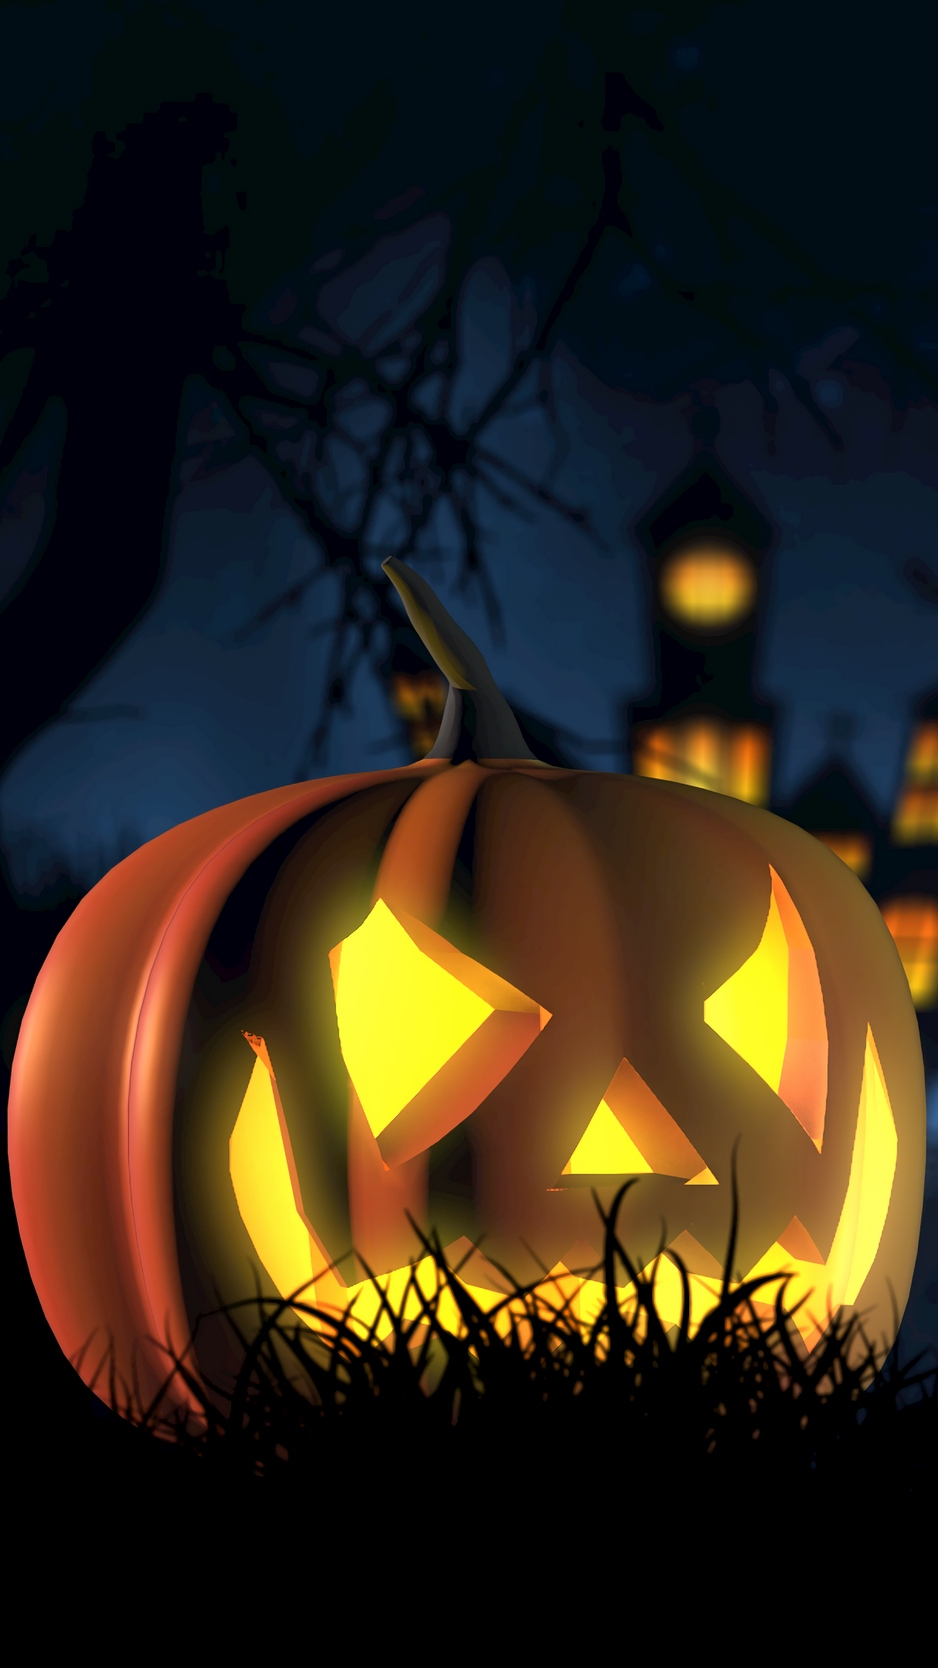 Wallpaper Halloween Pumpkin Spooky Face Autumn Pumpkin Halloween Background Iphone 938x1668 Wallpaper Teahub Io